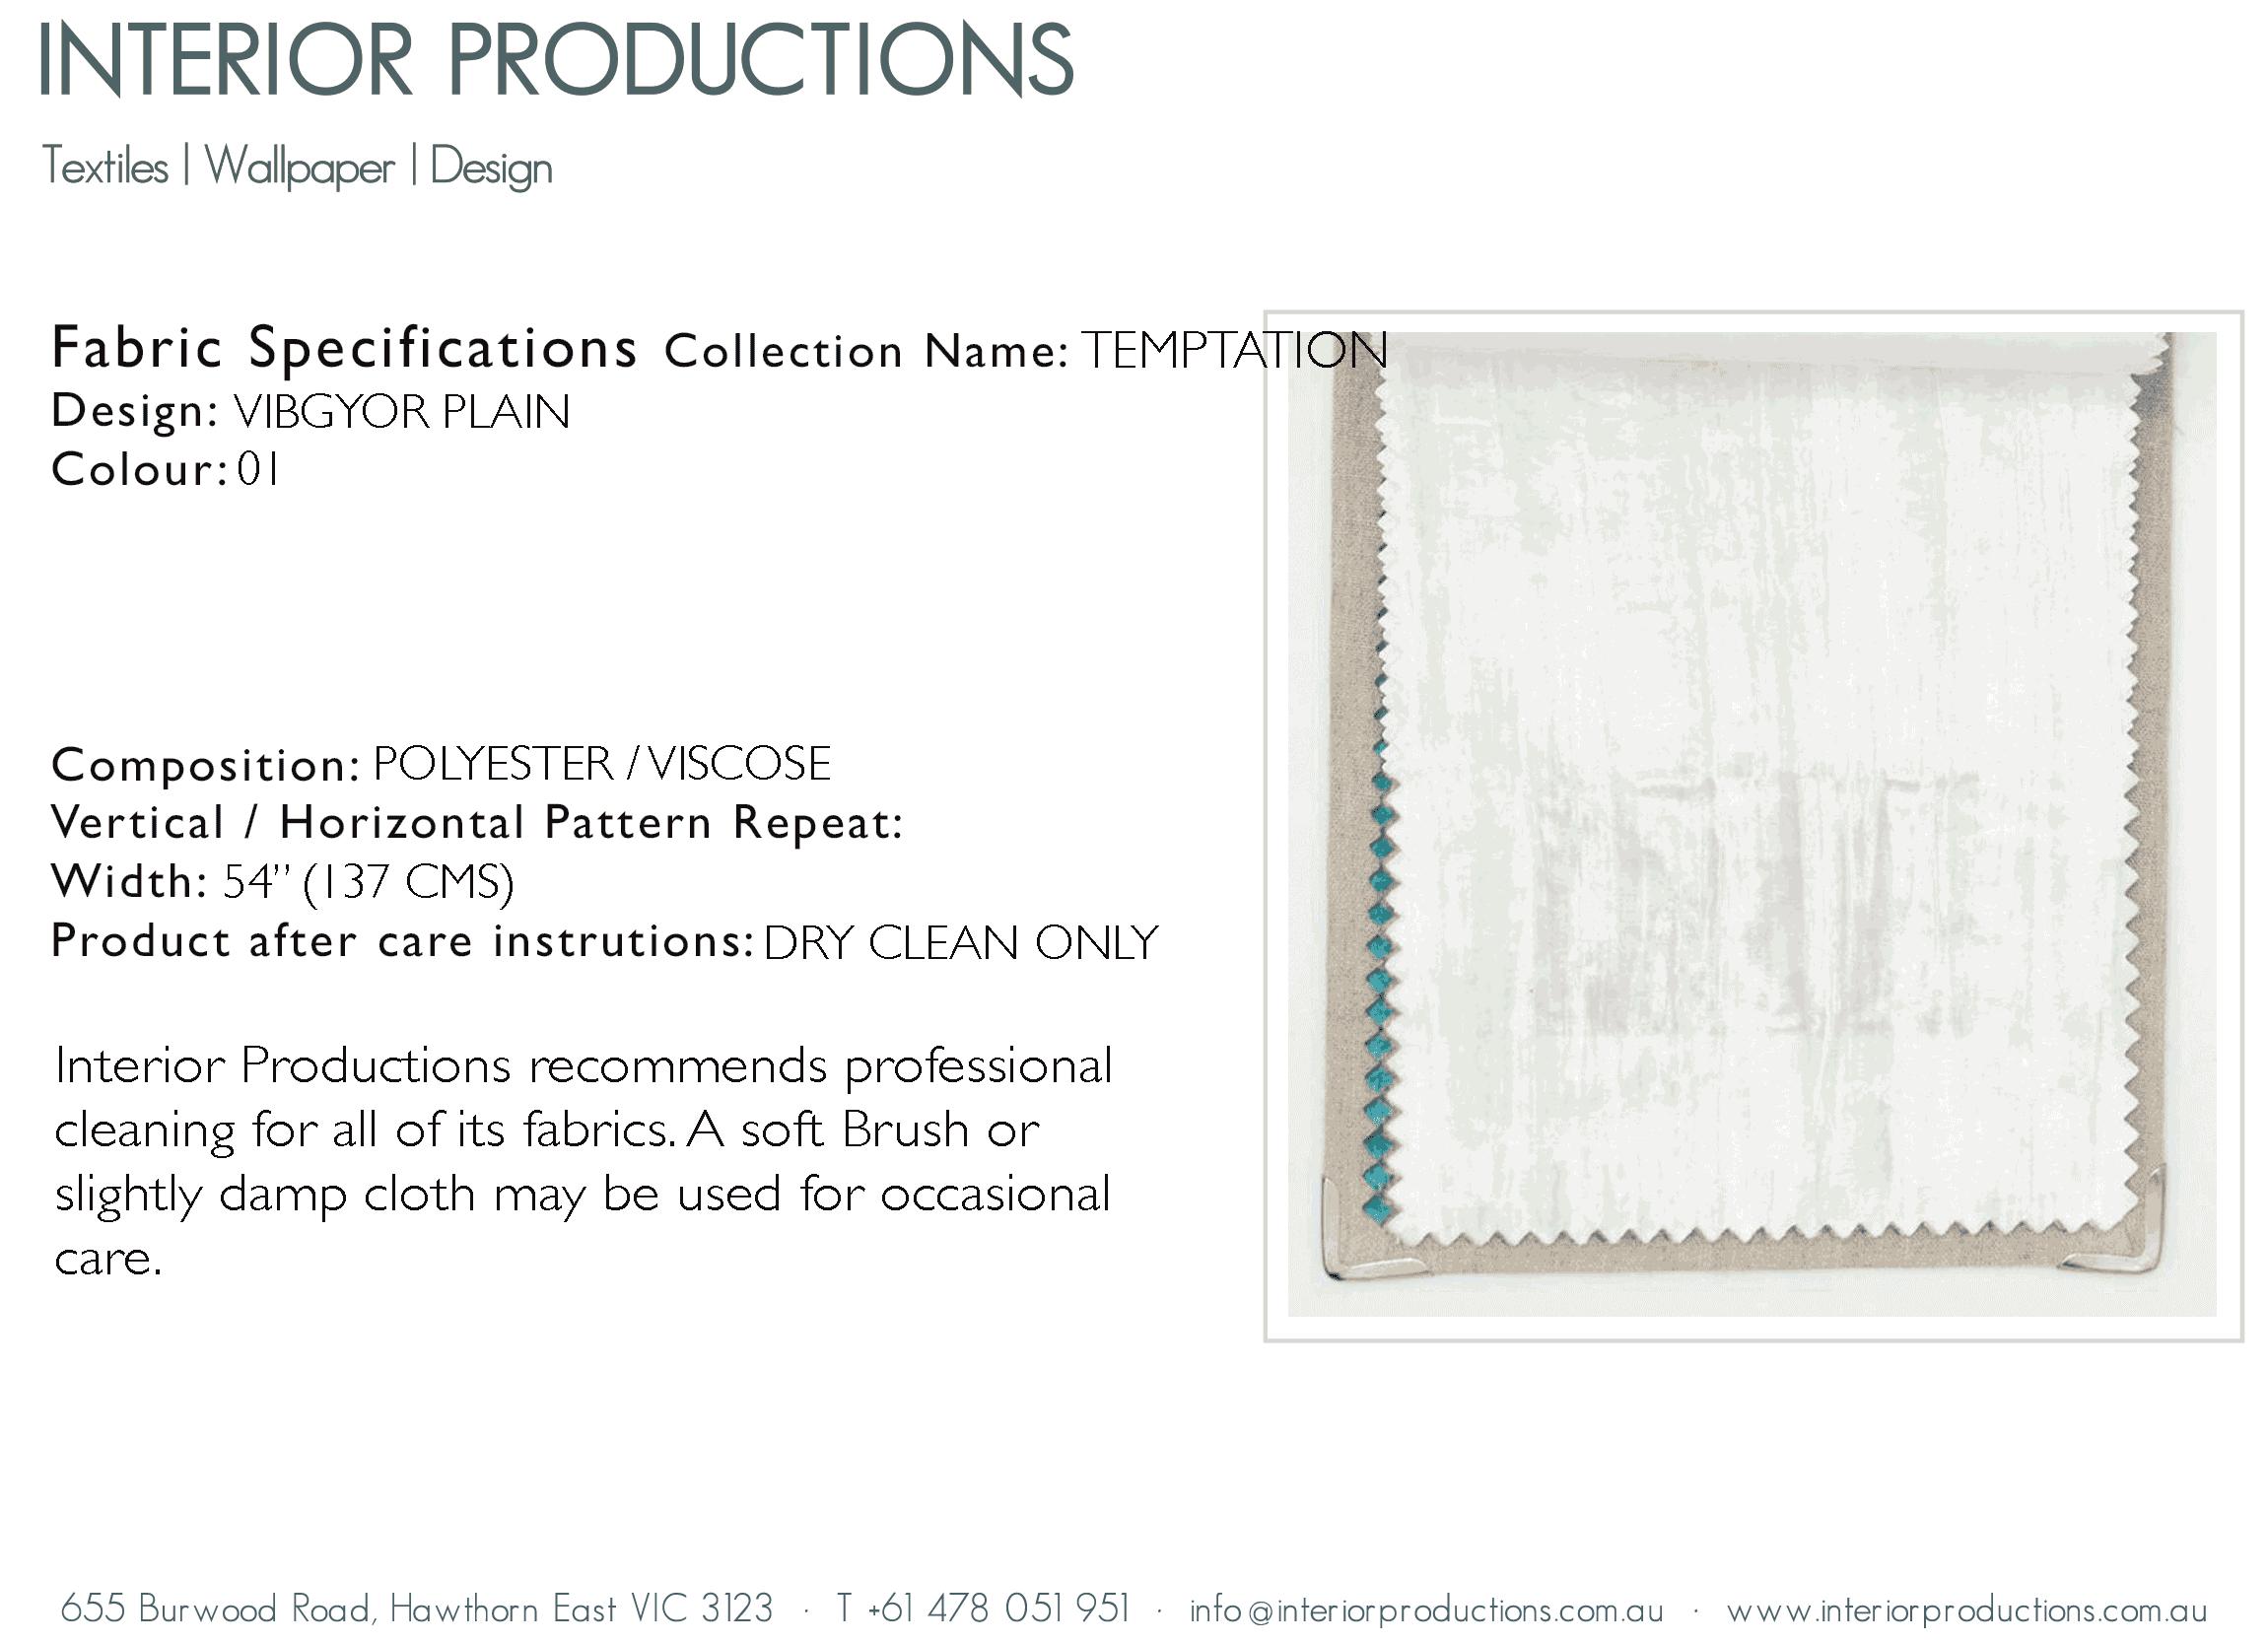 interior_productions_VIBGYOR-PLAIN---01